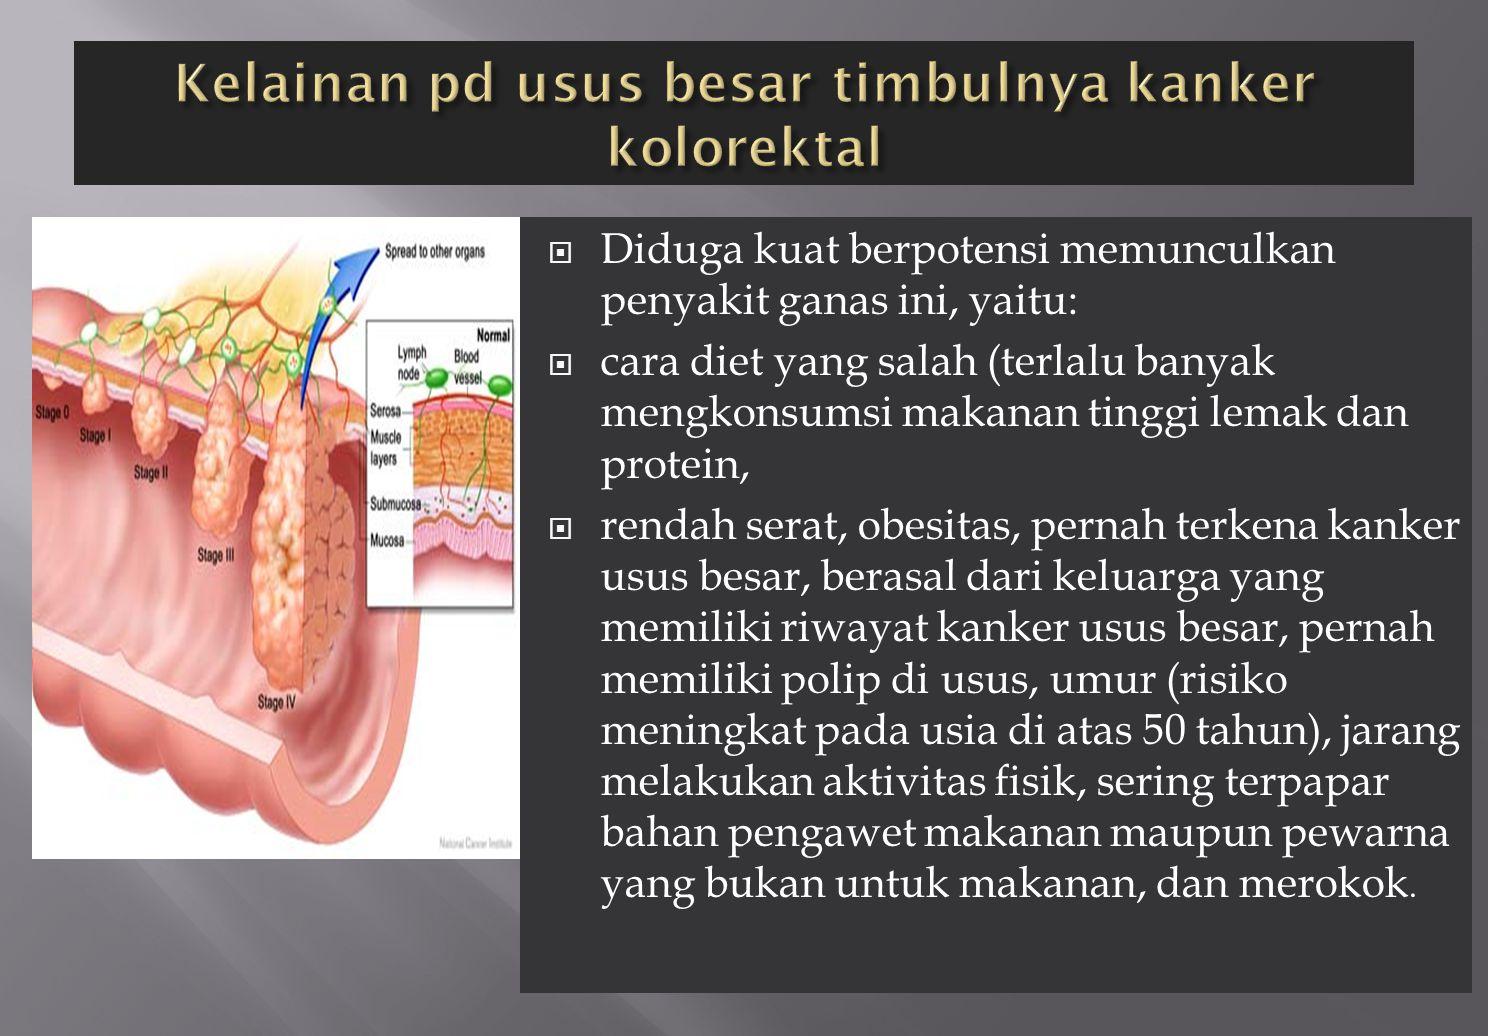 Kelainan pd usus besar timbulnya kanker kolorektal